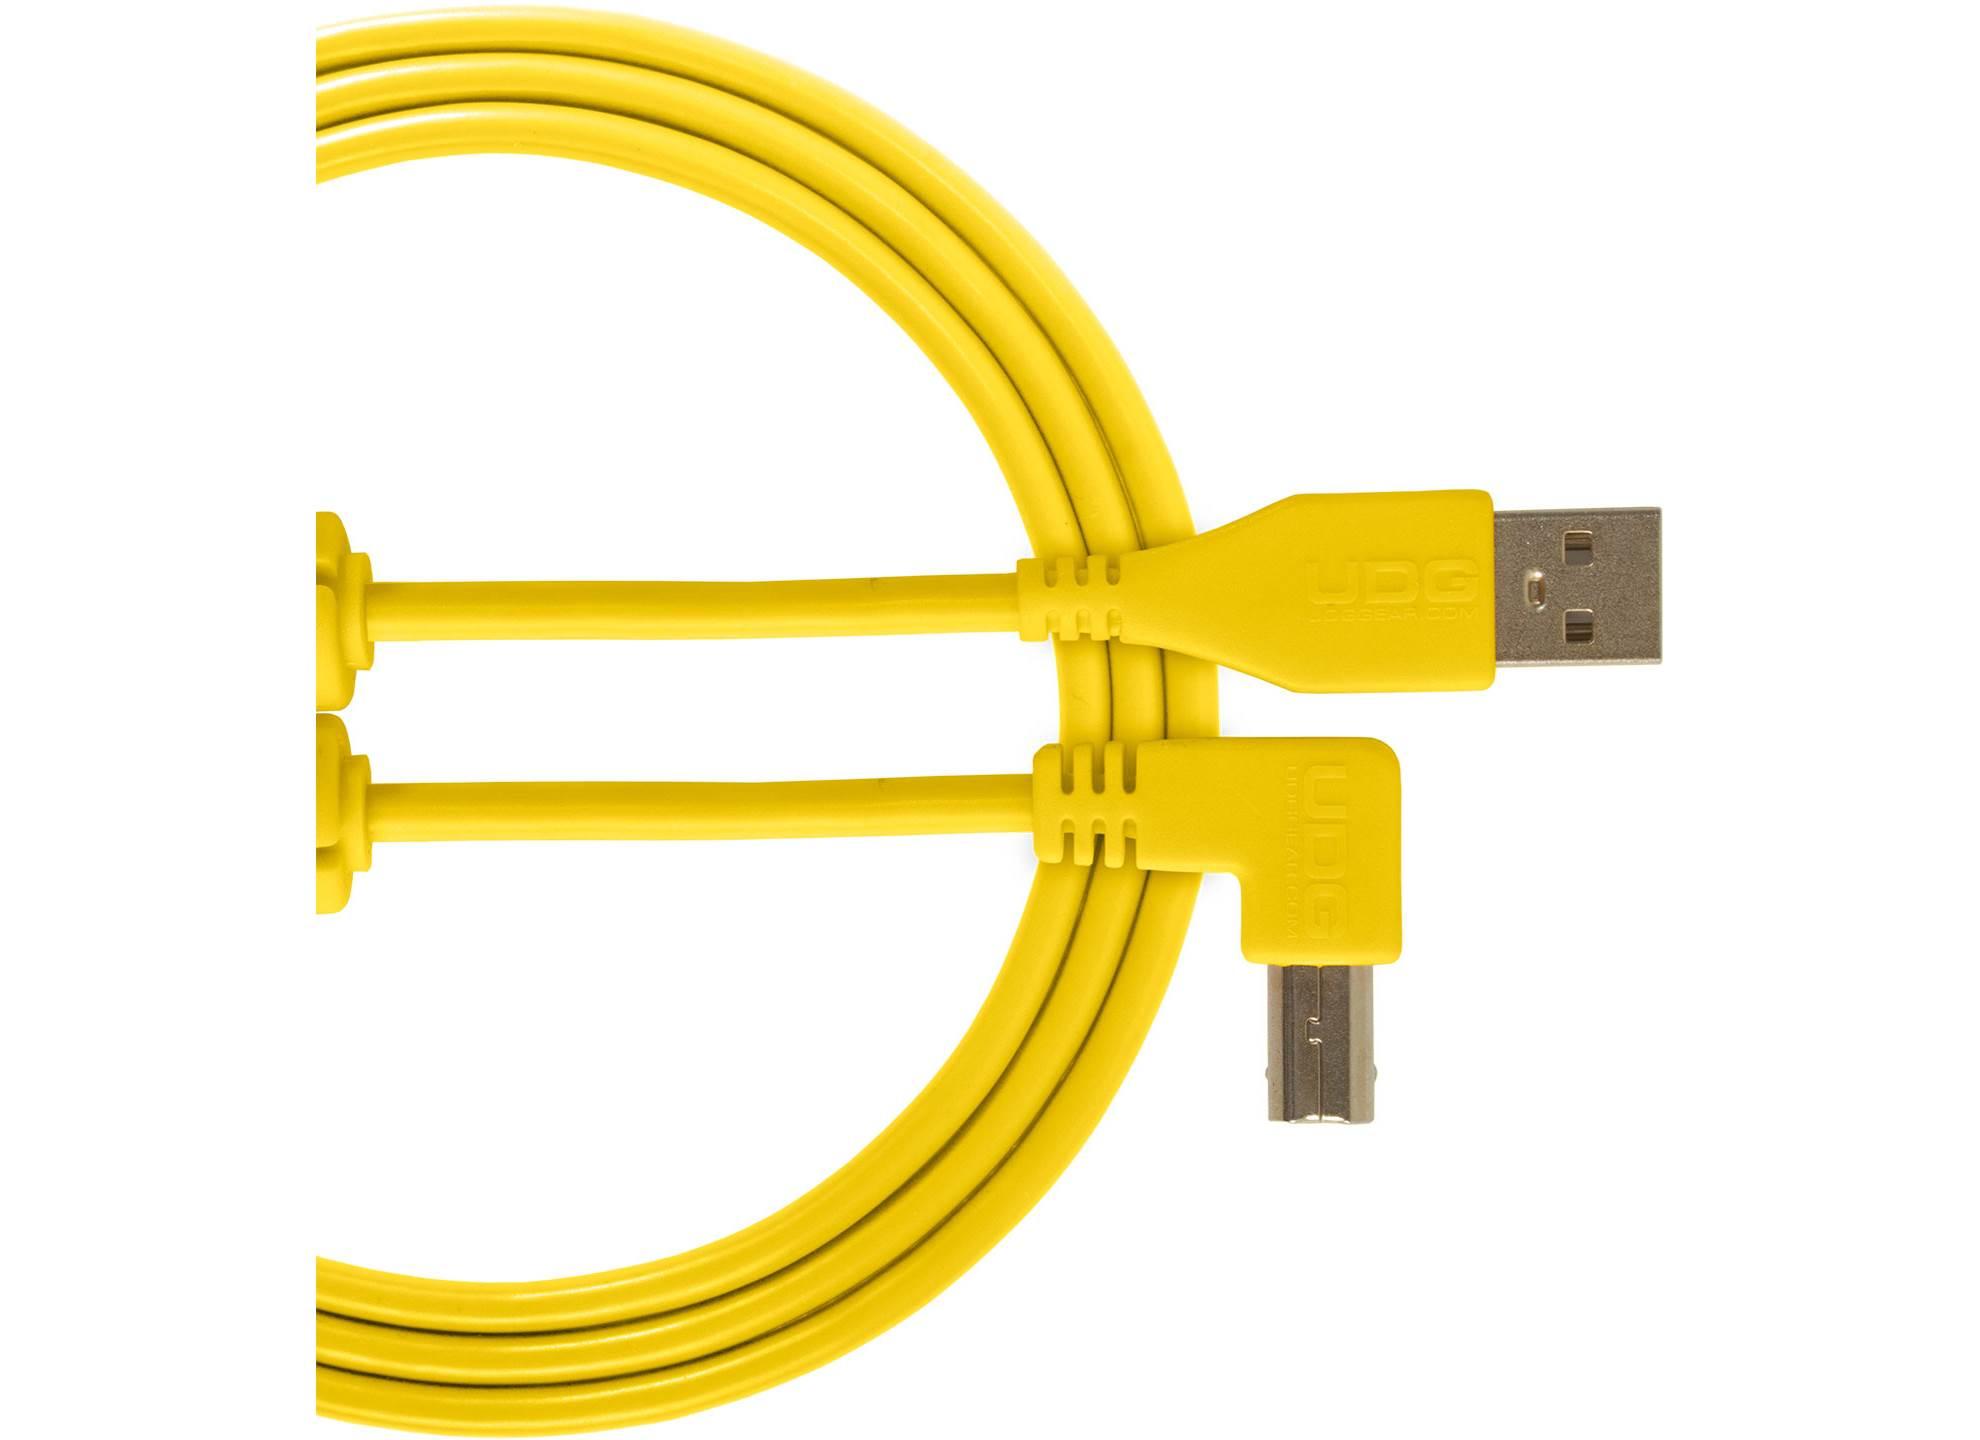 Ultimate USB 2.0 A-B Yellow Angled 2m